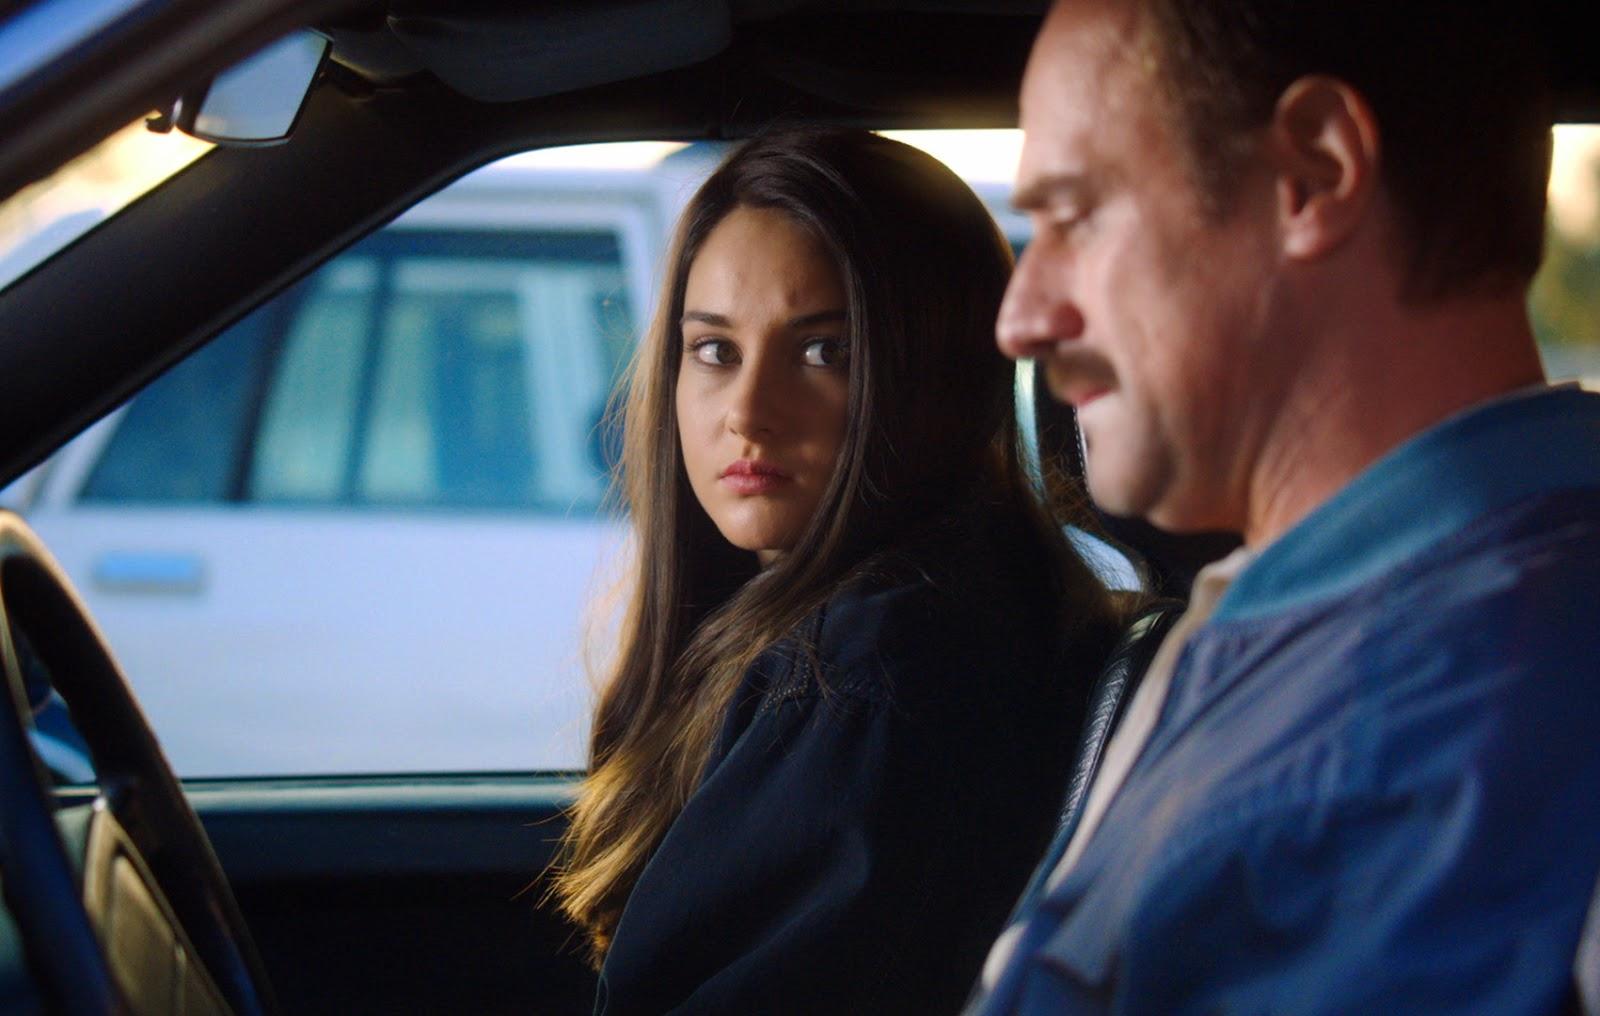 Chris Meloni Brian Bloom Best cinema romantico: december 2014